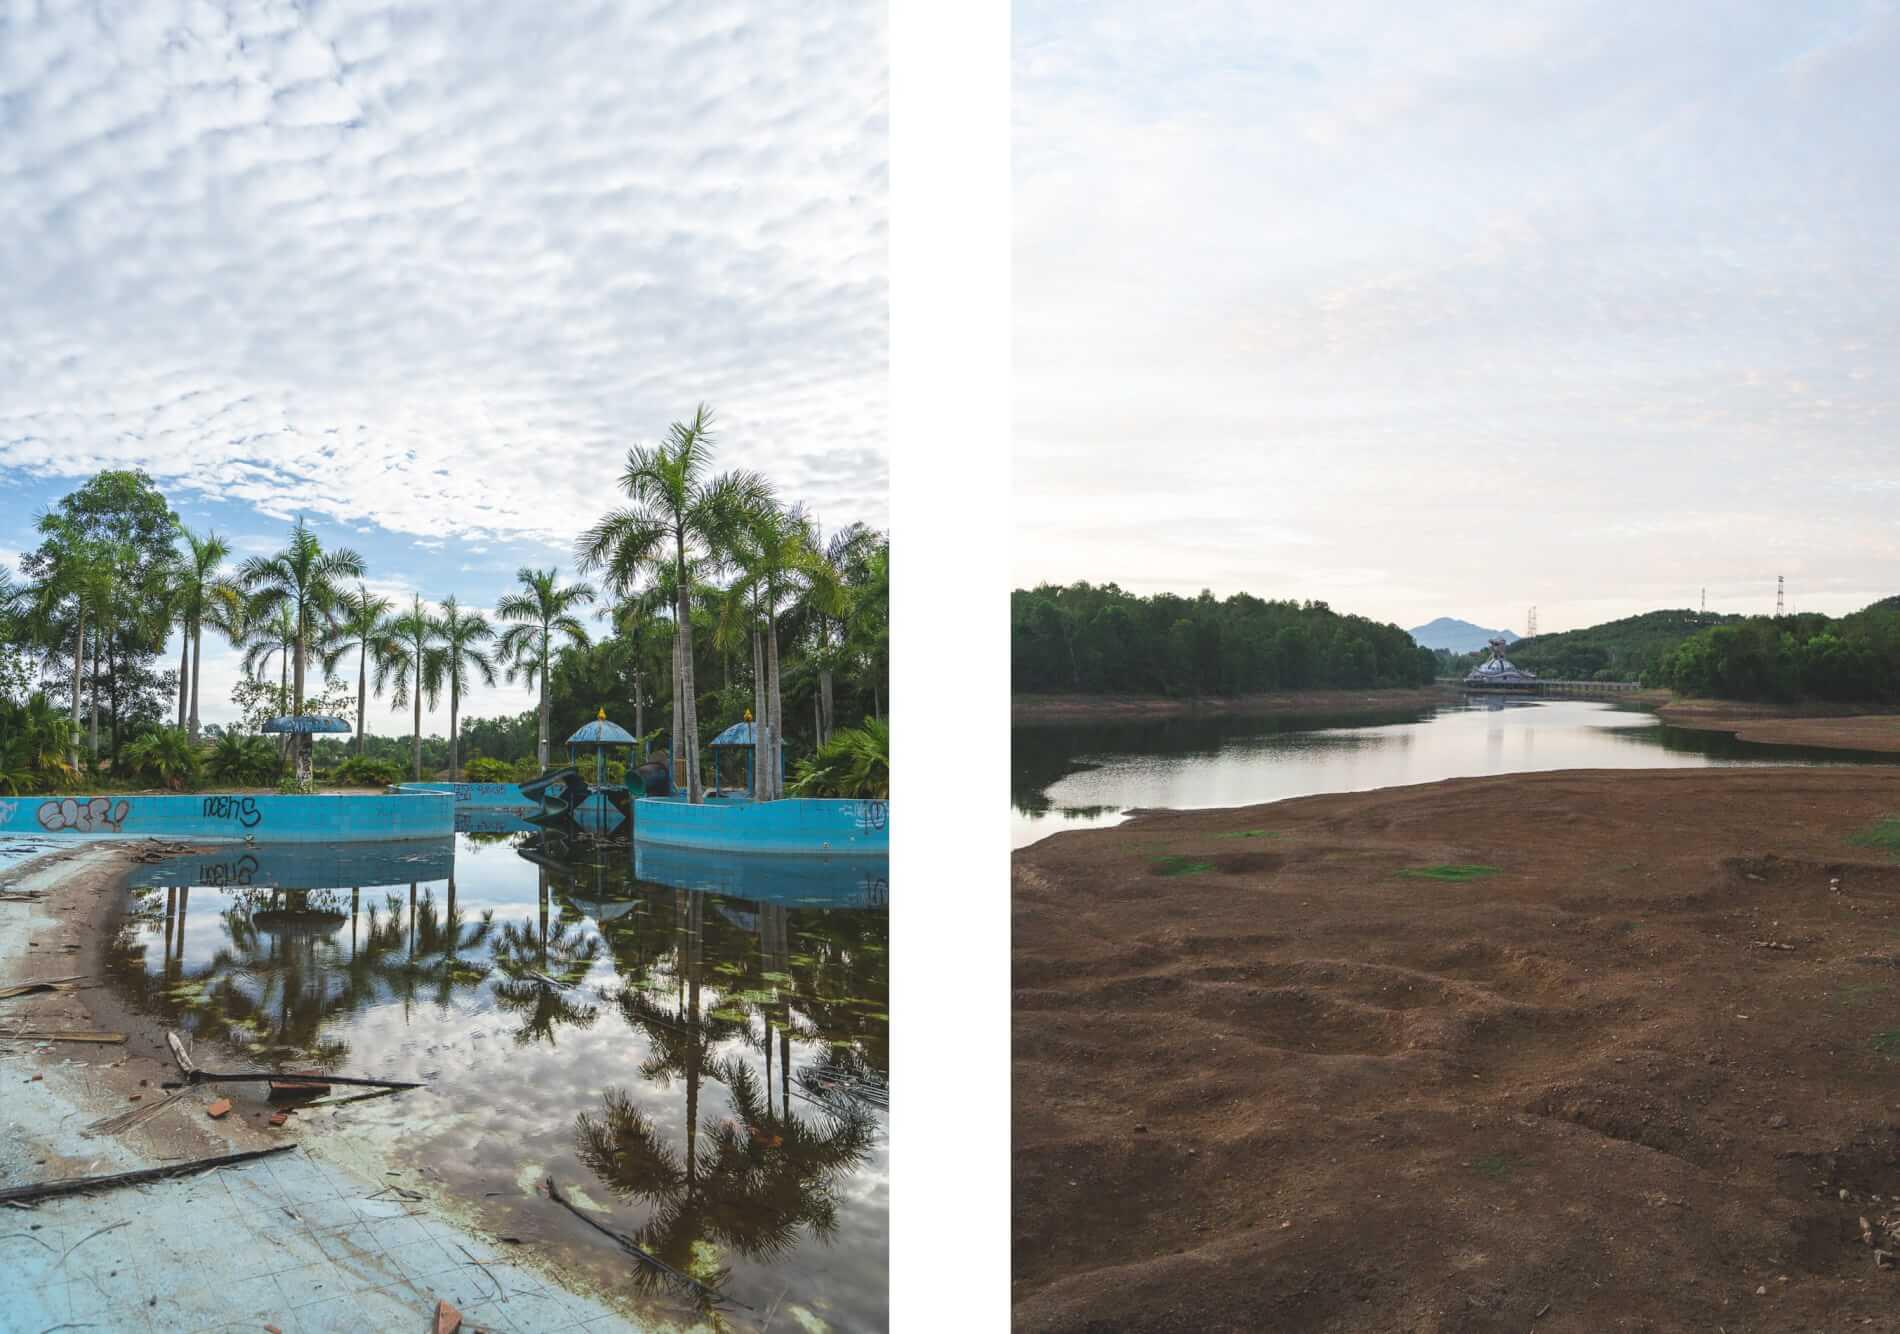 Visiting Hue's abandoned water park